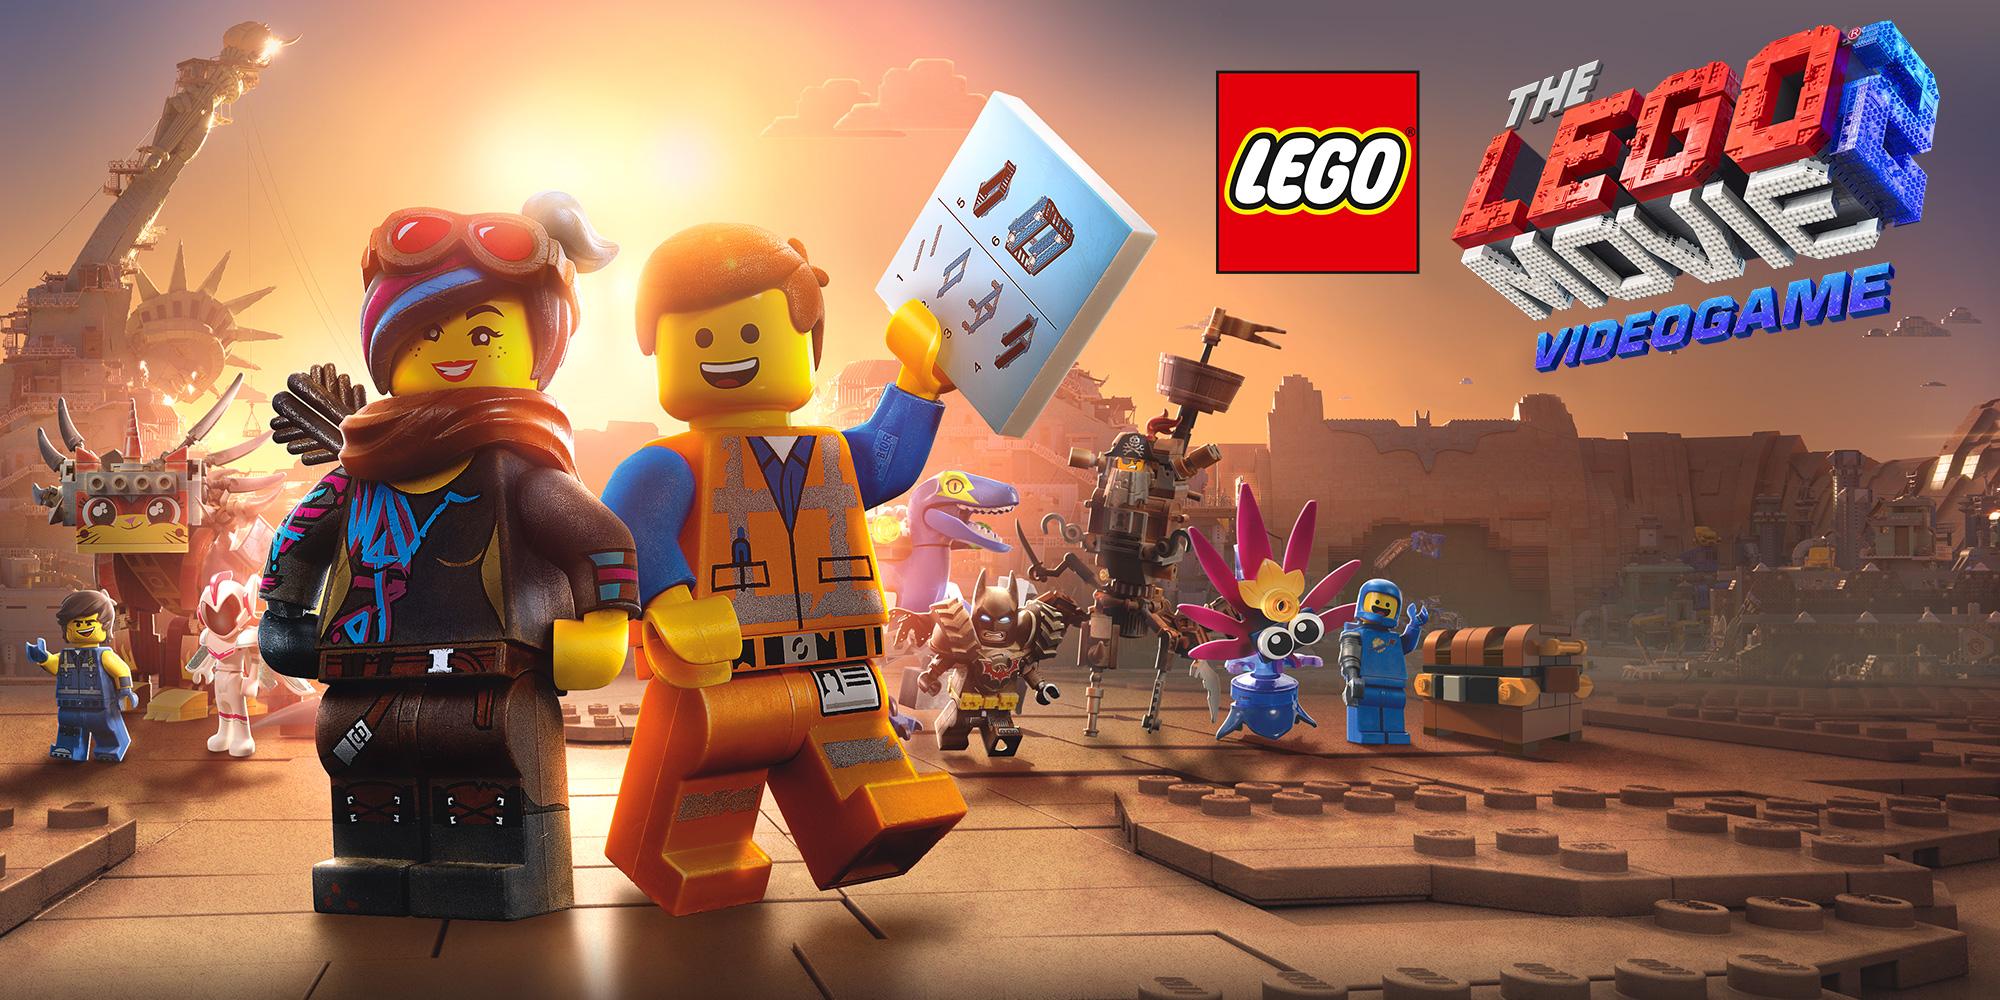 The Lego Movie 2 Videogame Nintendo Switch Games Nintendo